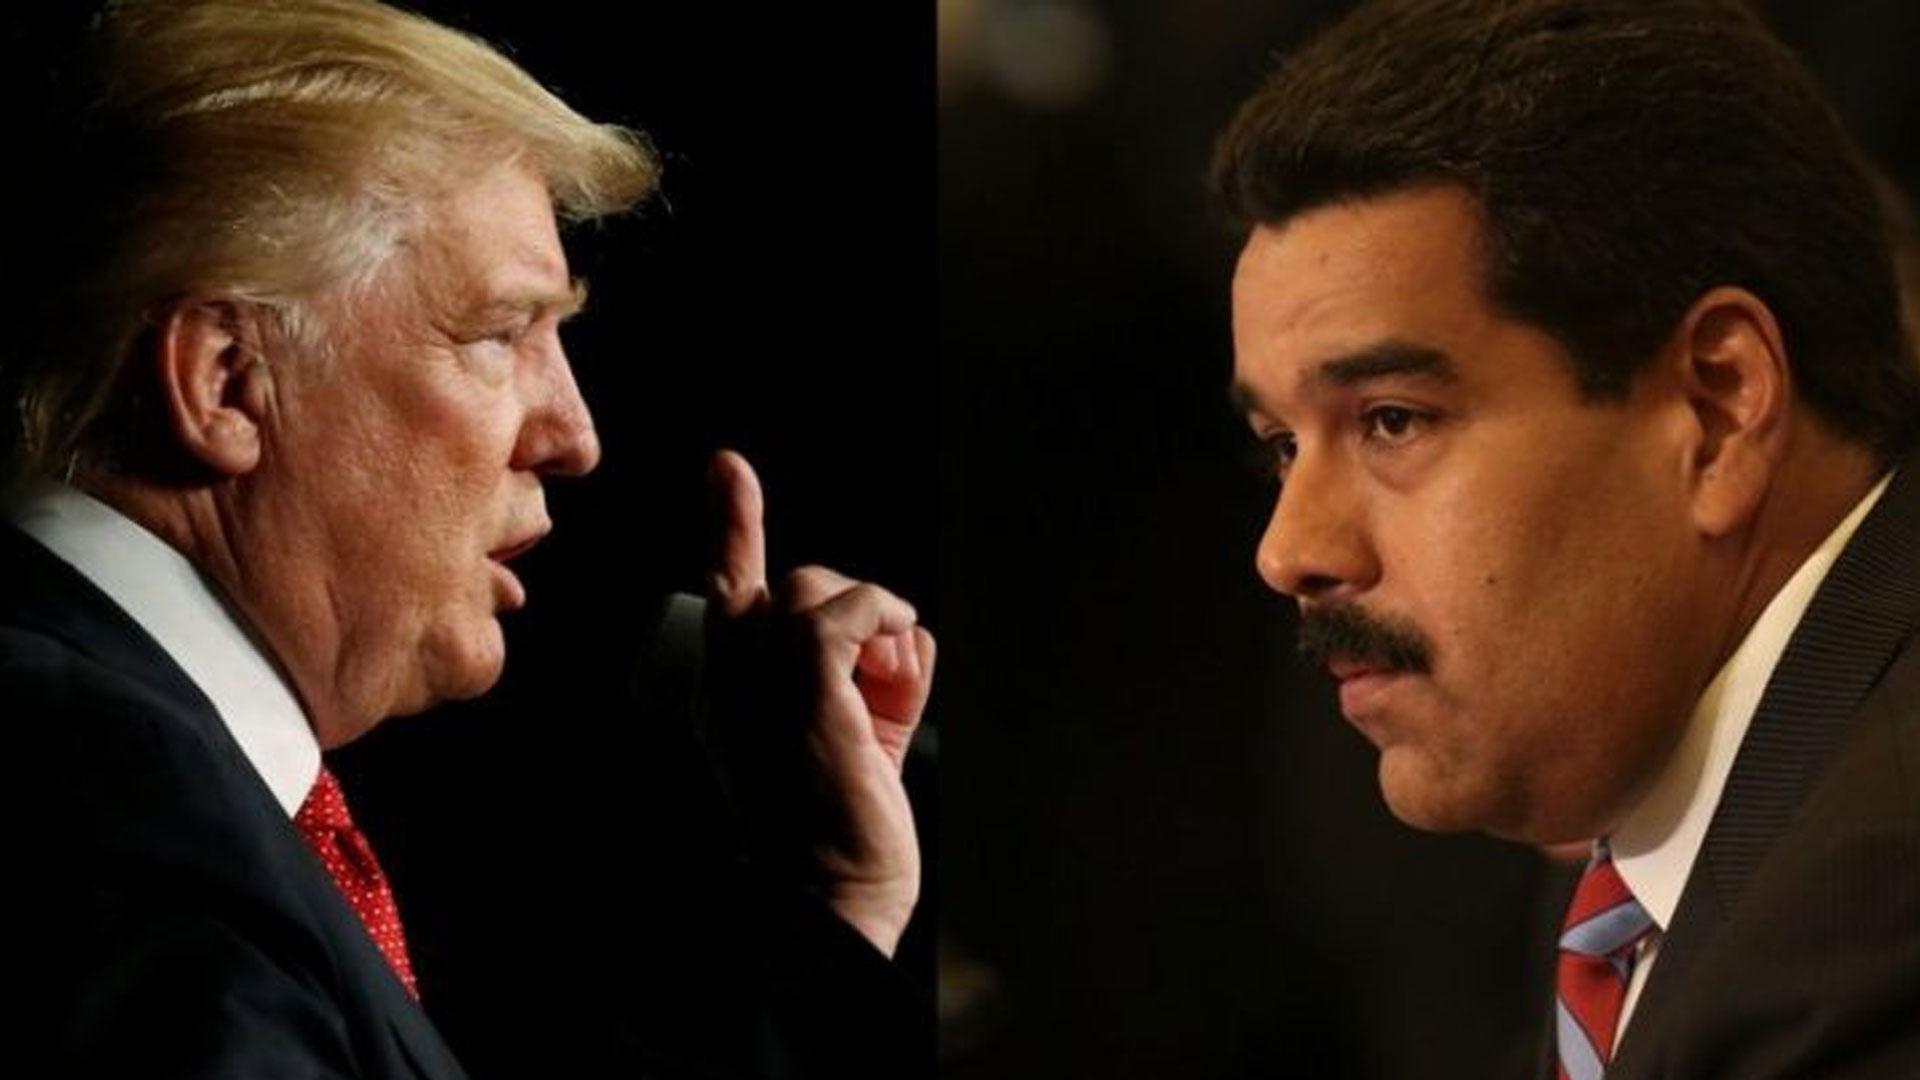 Gobierno de Trump acusa a Maduro de narcoterrorismo